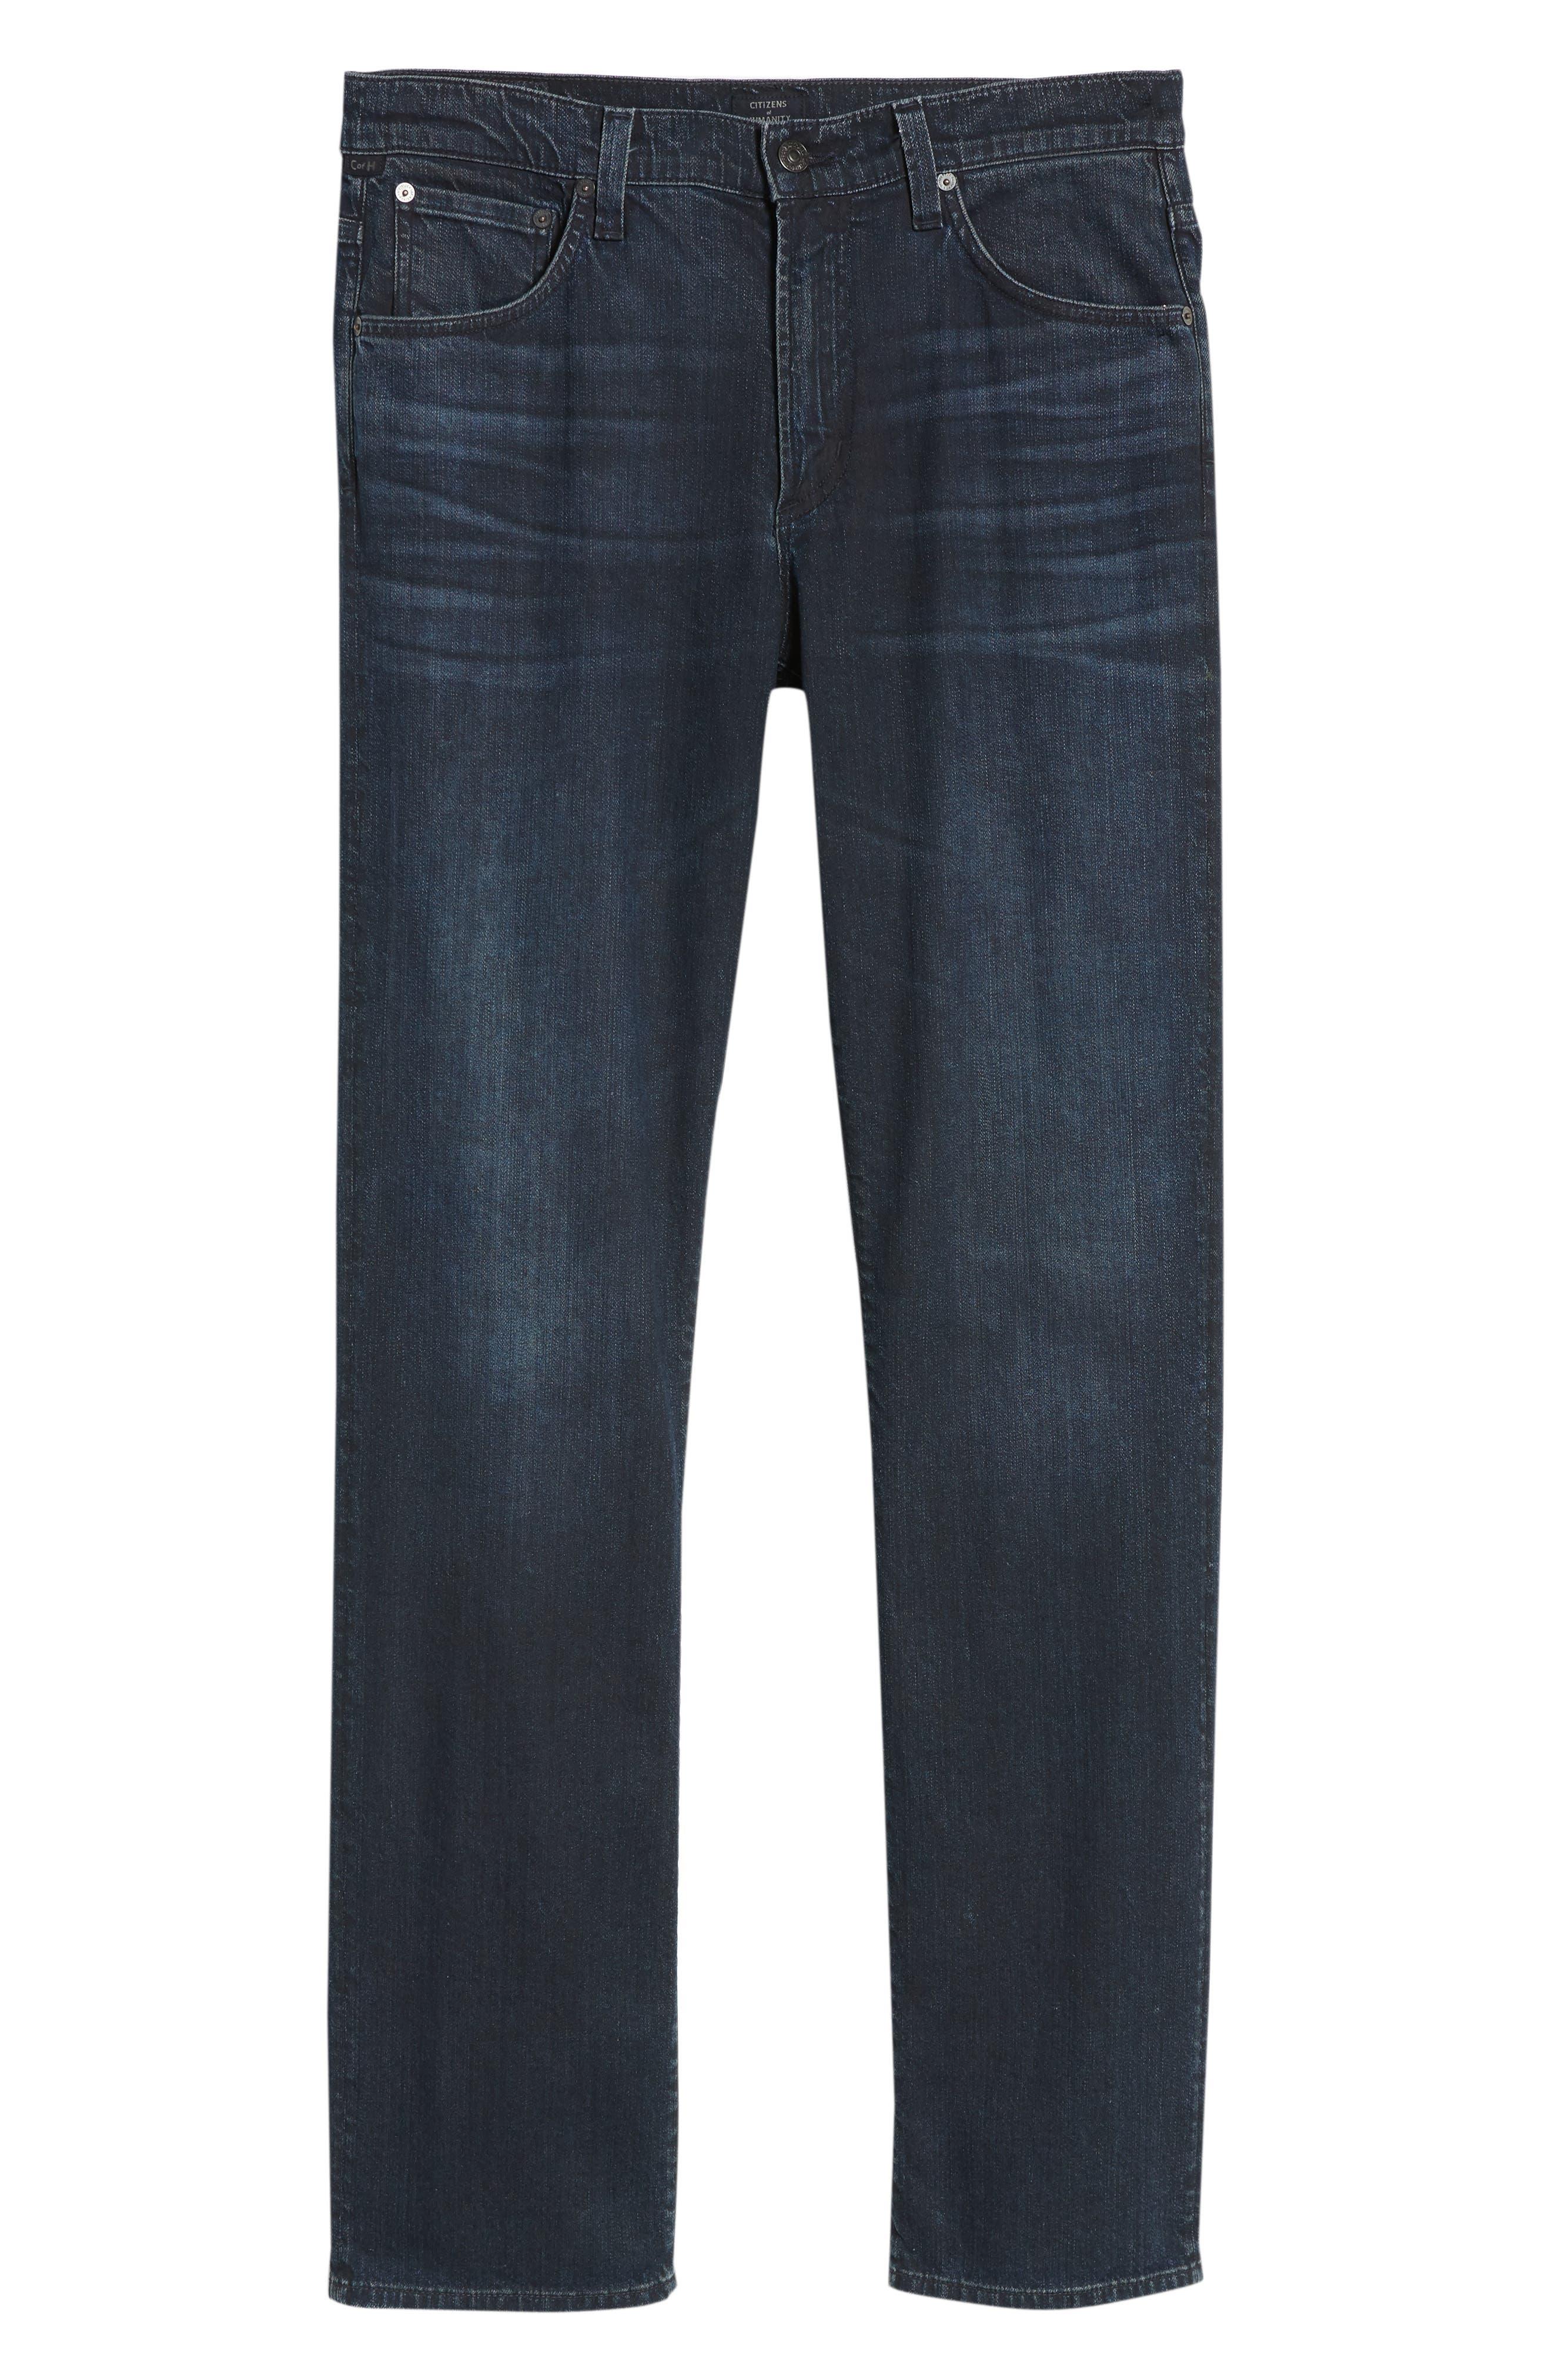 Sid Straight Leg Jeans,                             Alternate thumbnail 6, color,                             410